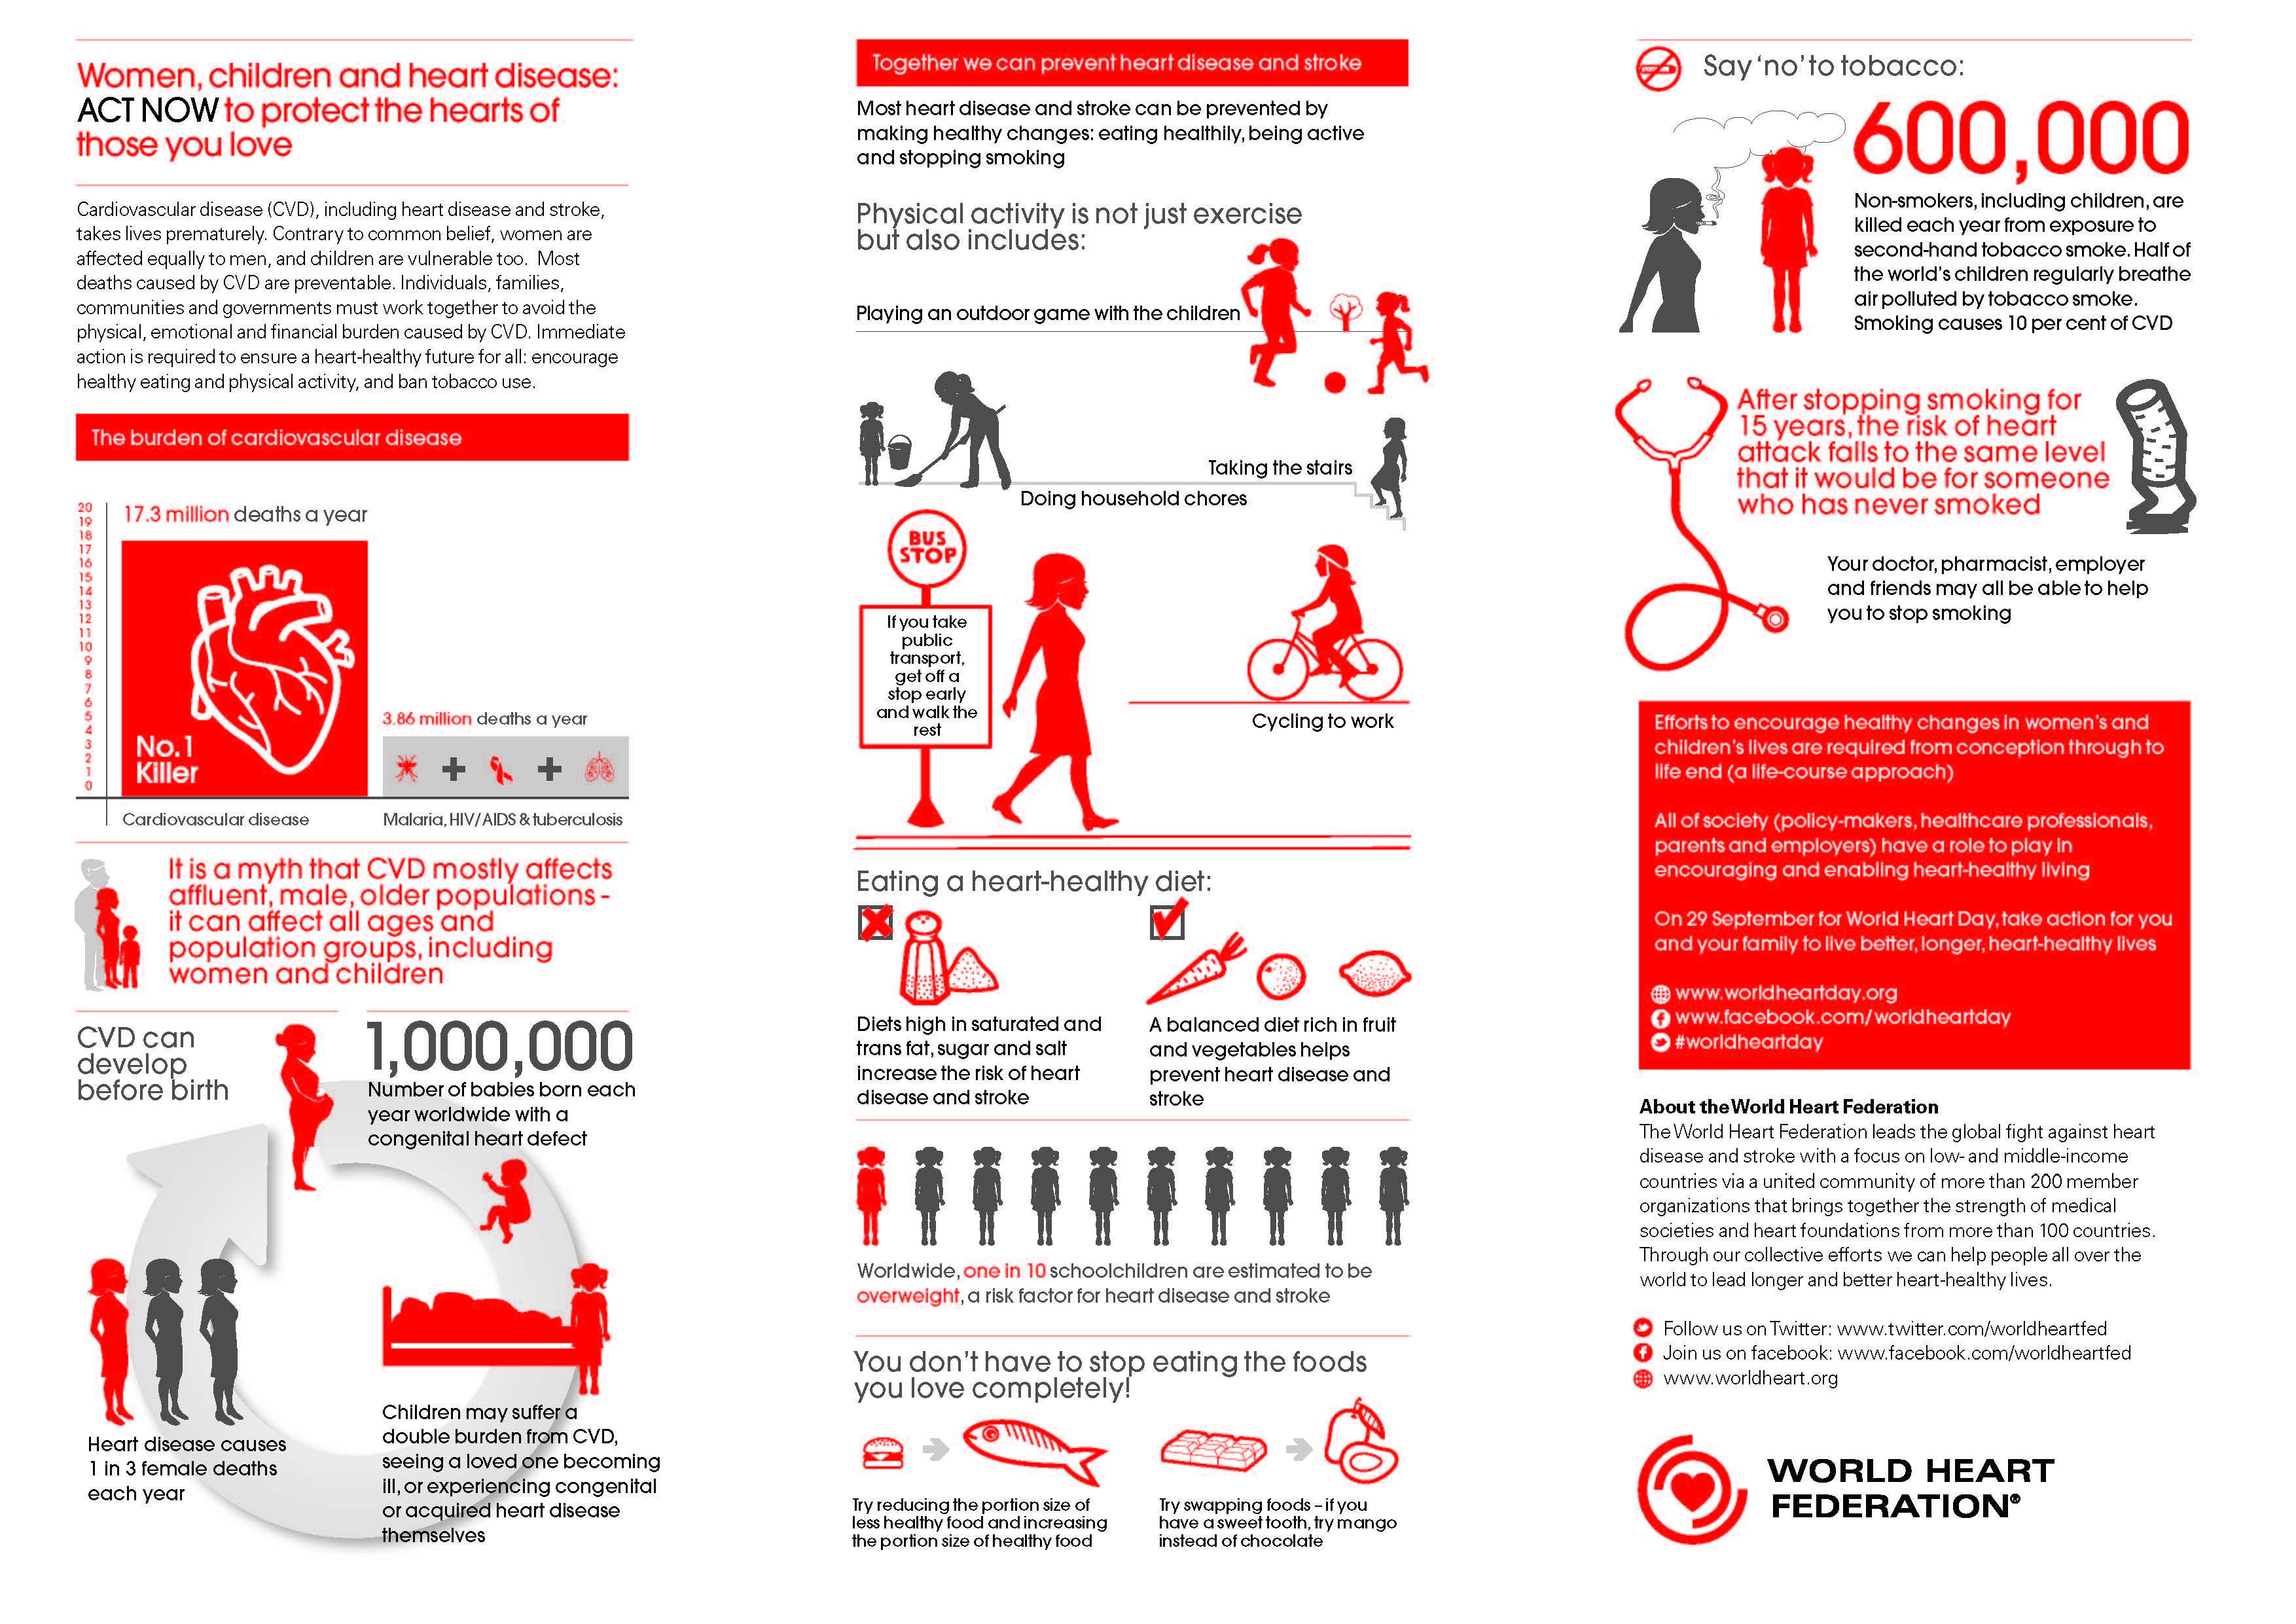 Congenital heart disease in children. Congenital and acquired heart defects 19